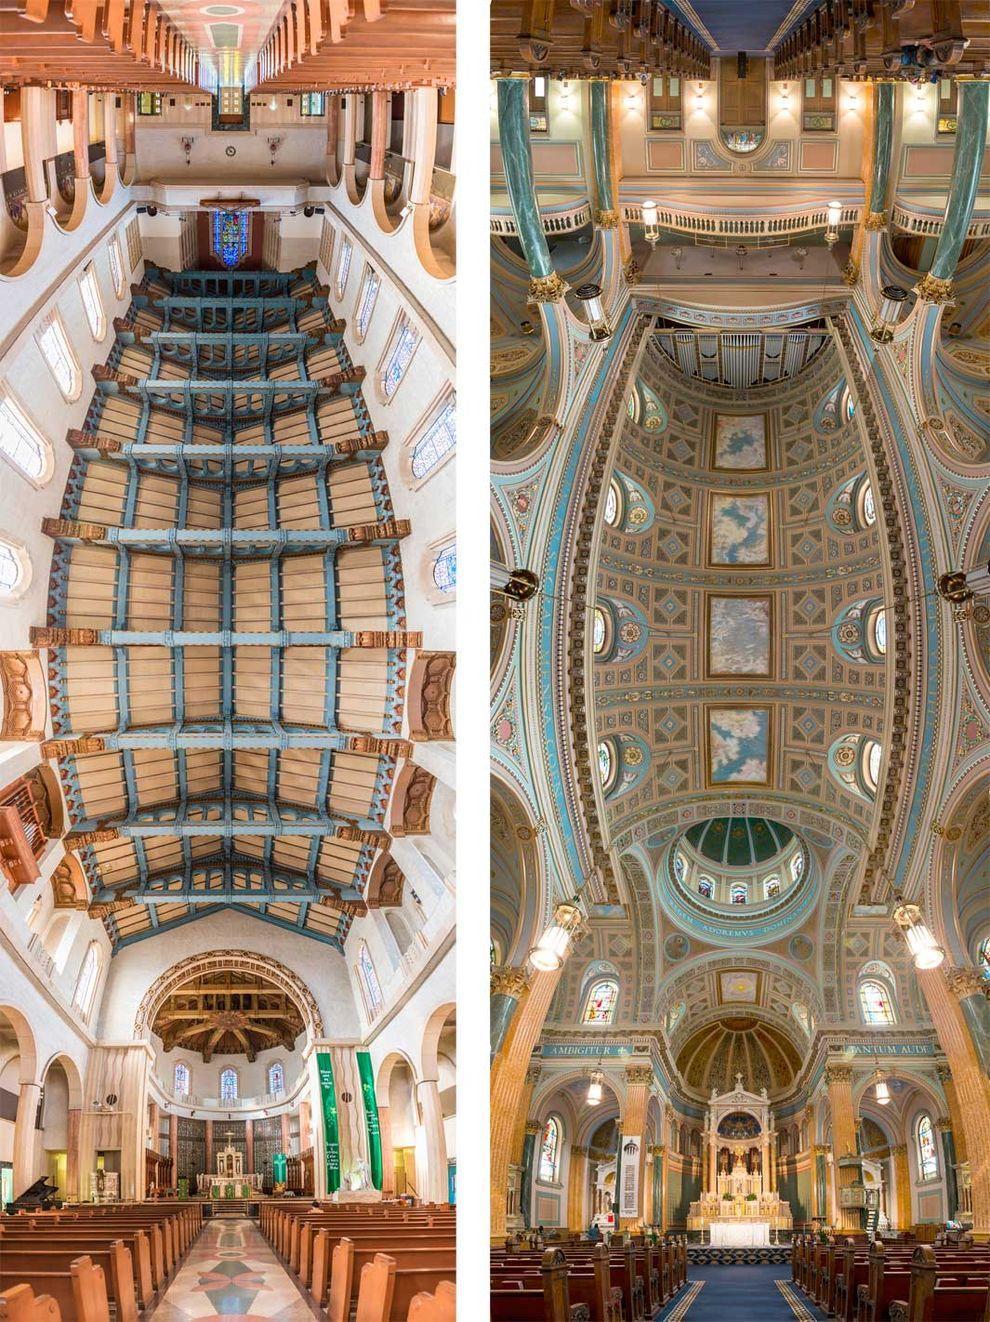 Church01 Потрясающие снимки храмов от входа до алтаря в одном фото